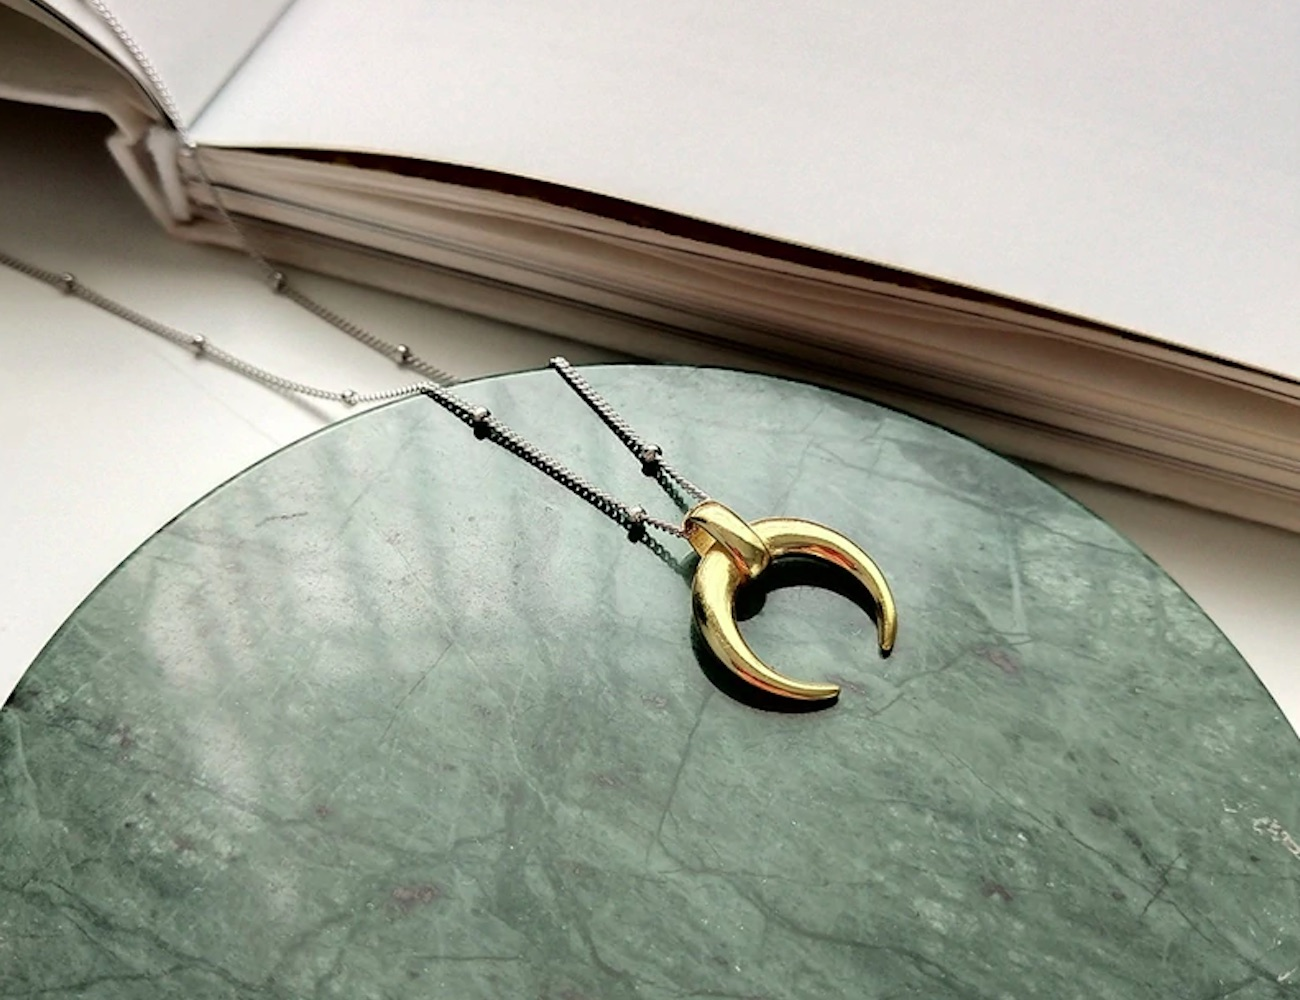 Silver Crescent Moon Pendant Necklace sports a dual color design